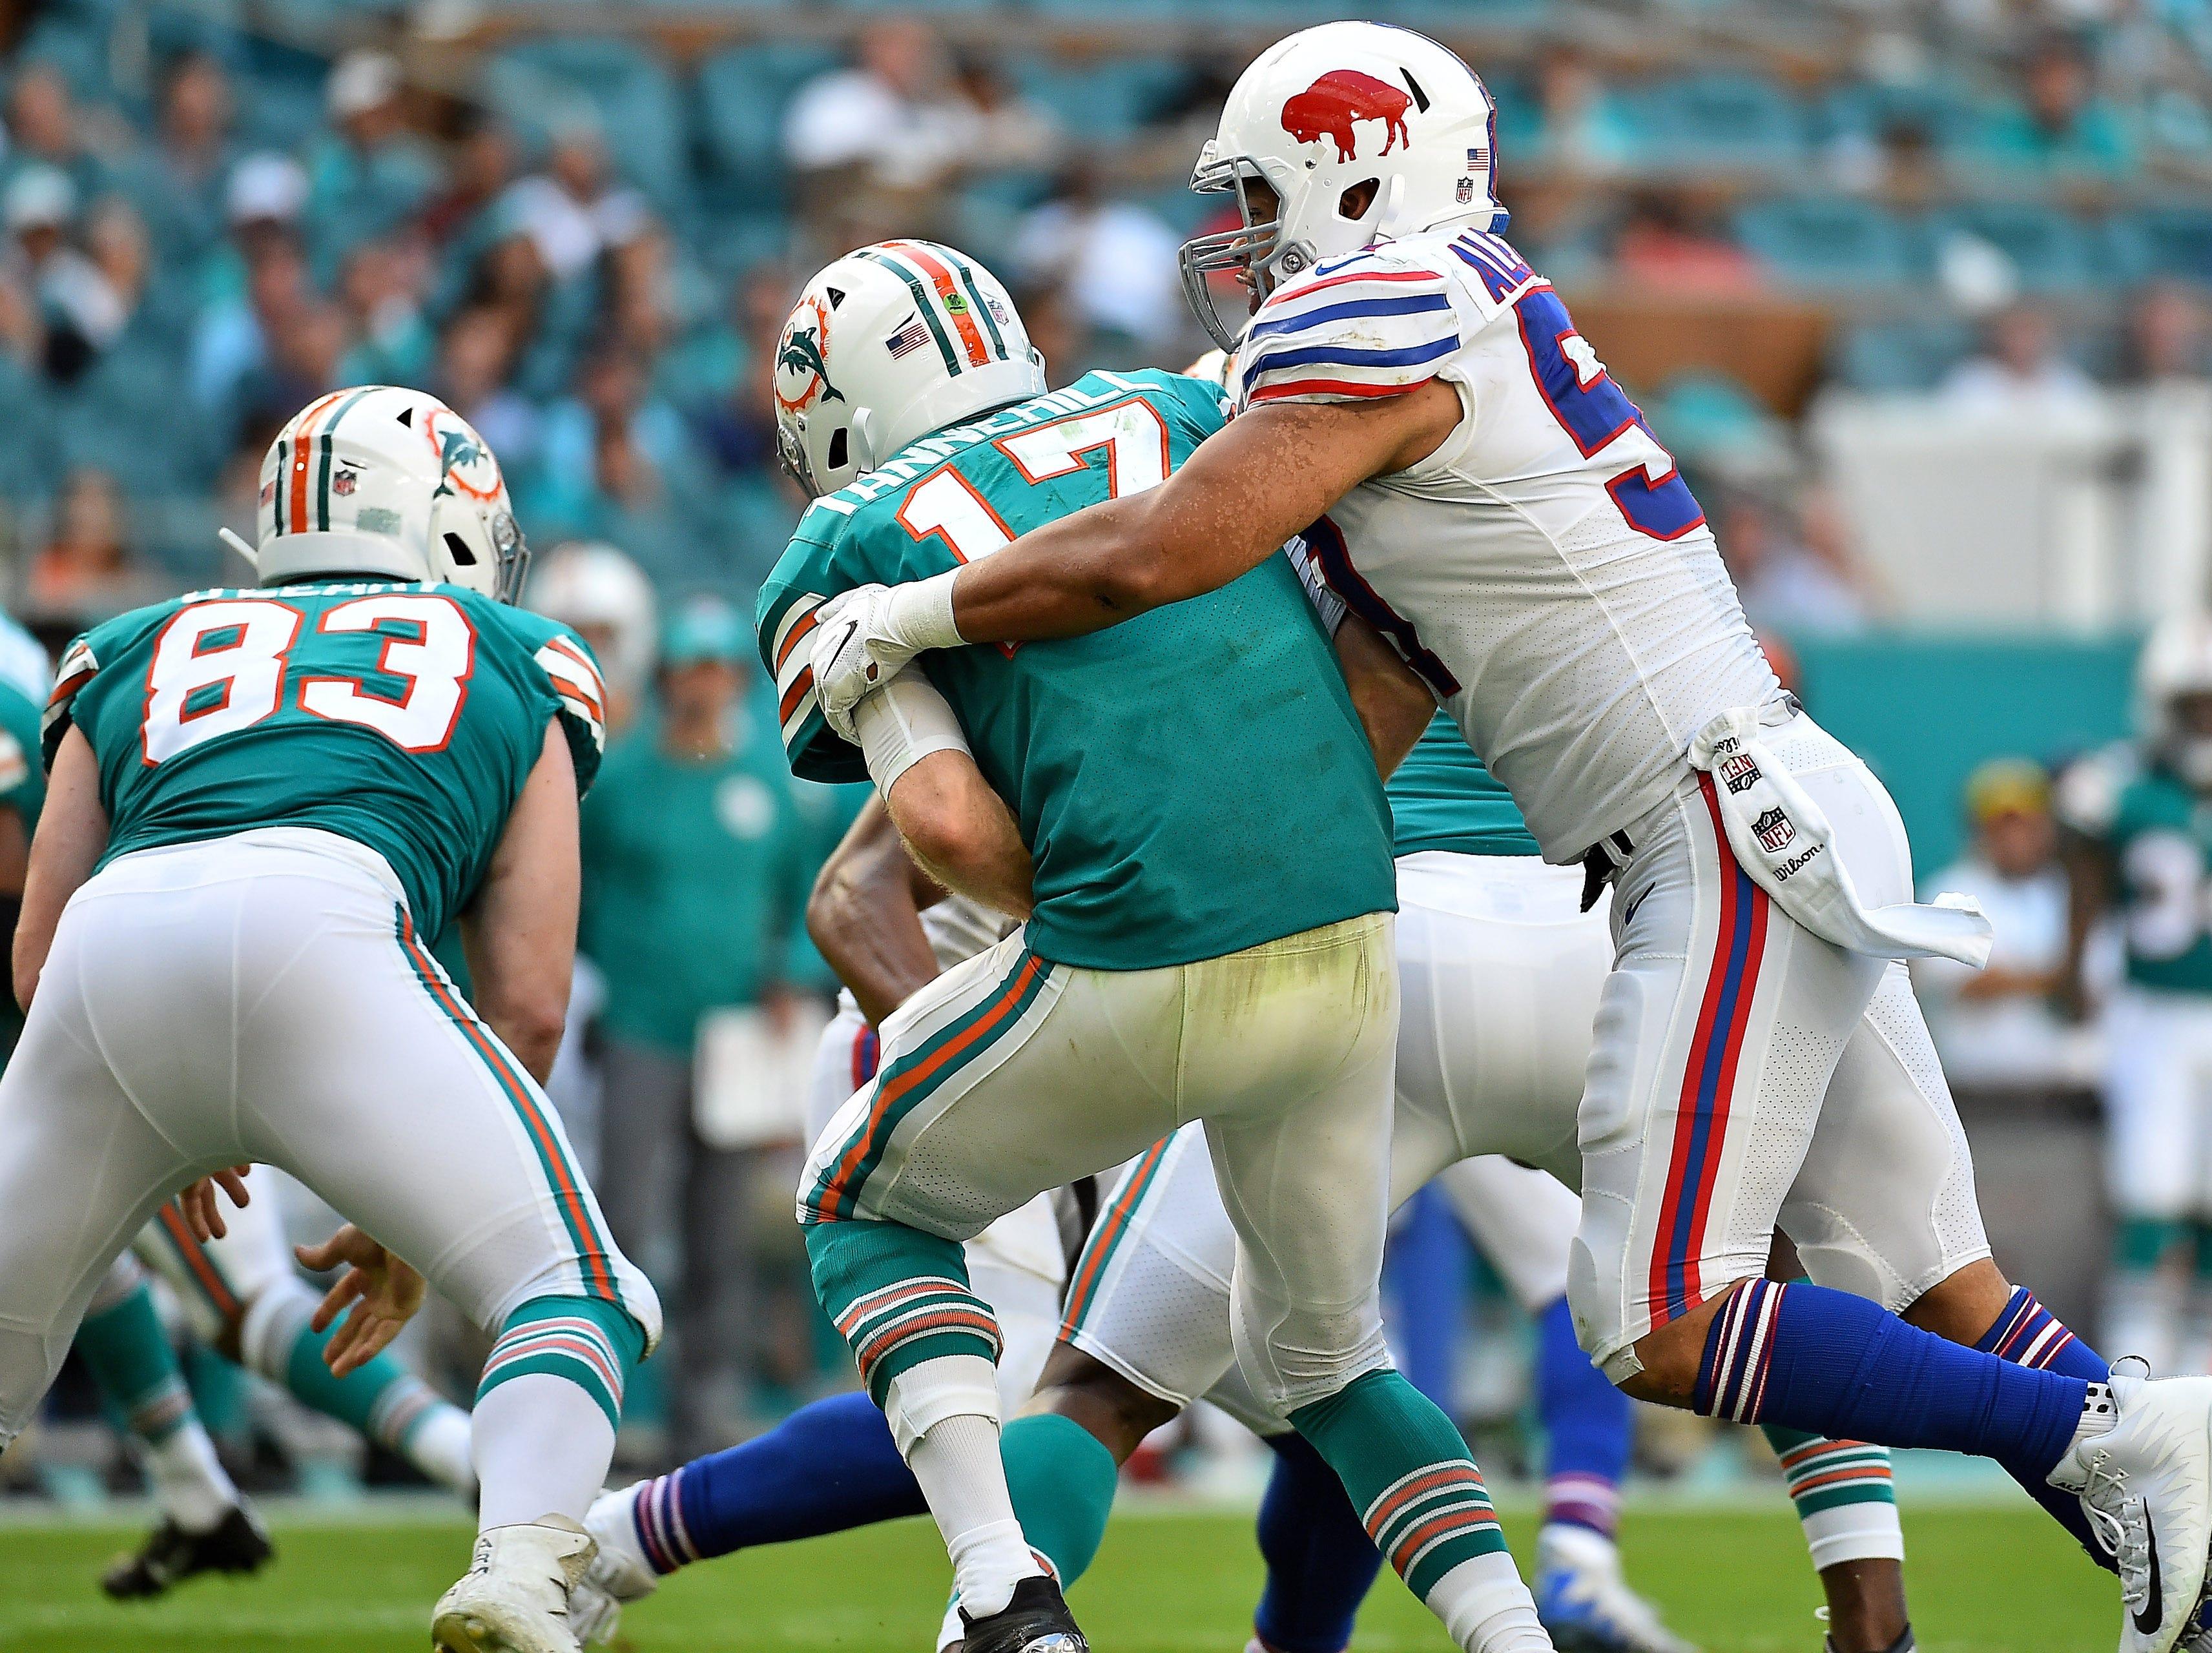 Dec 2, 2018; Miami Gardens, FL, USA; Buffalo Bills outside linebacker Lorenzo Alexander (57) sacks Miami Dolphins quarterback Ryan Tannehill (17) during the first half at Hard Rock Stadium. Mandatory Credit: Jasen Vinlove-USA TODAY Sports